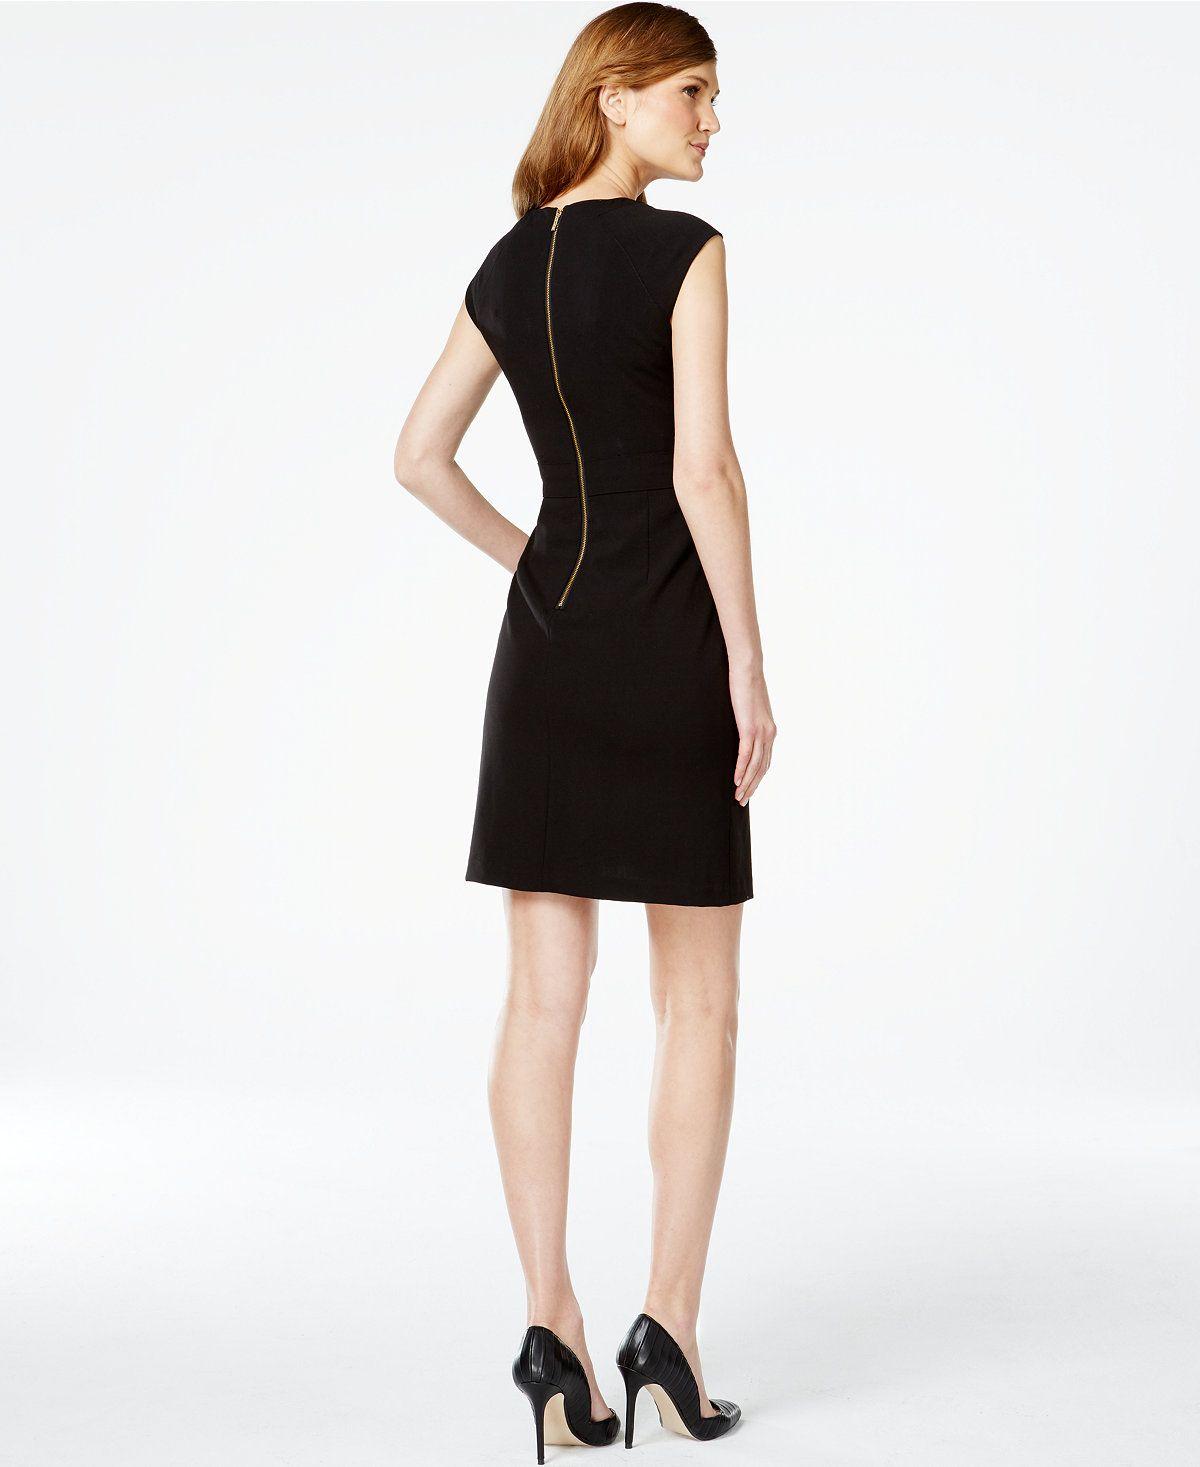 15+ Calvin klein black dress macys ideas